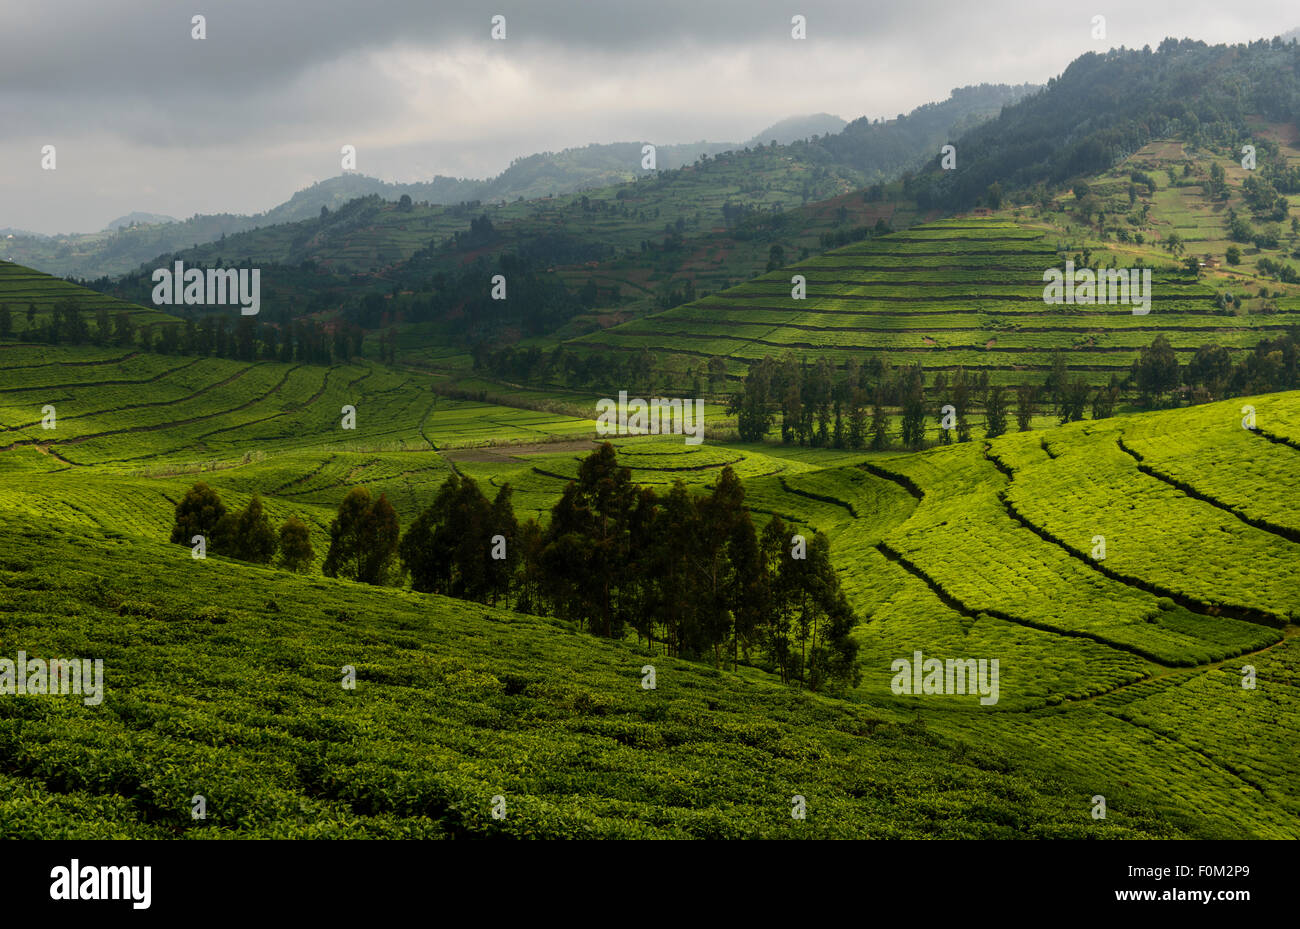 Tea plantations of western Rwanda, Africa - Stock Image